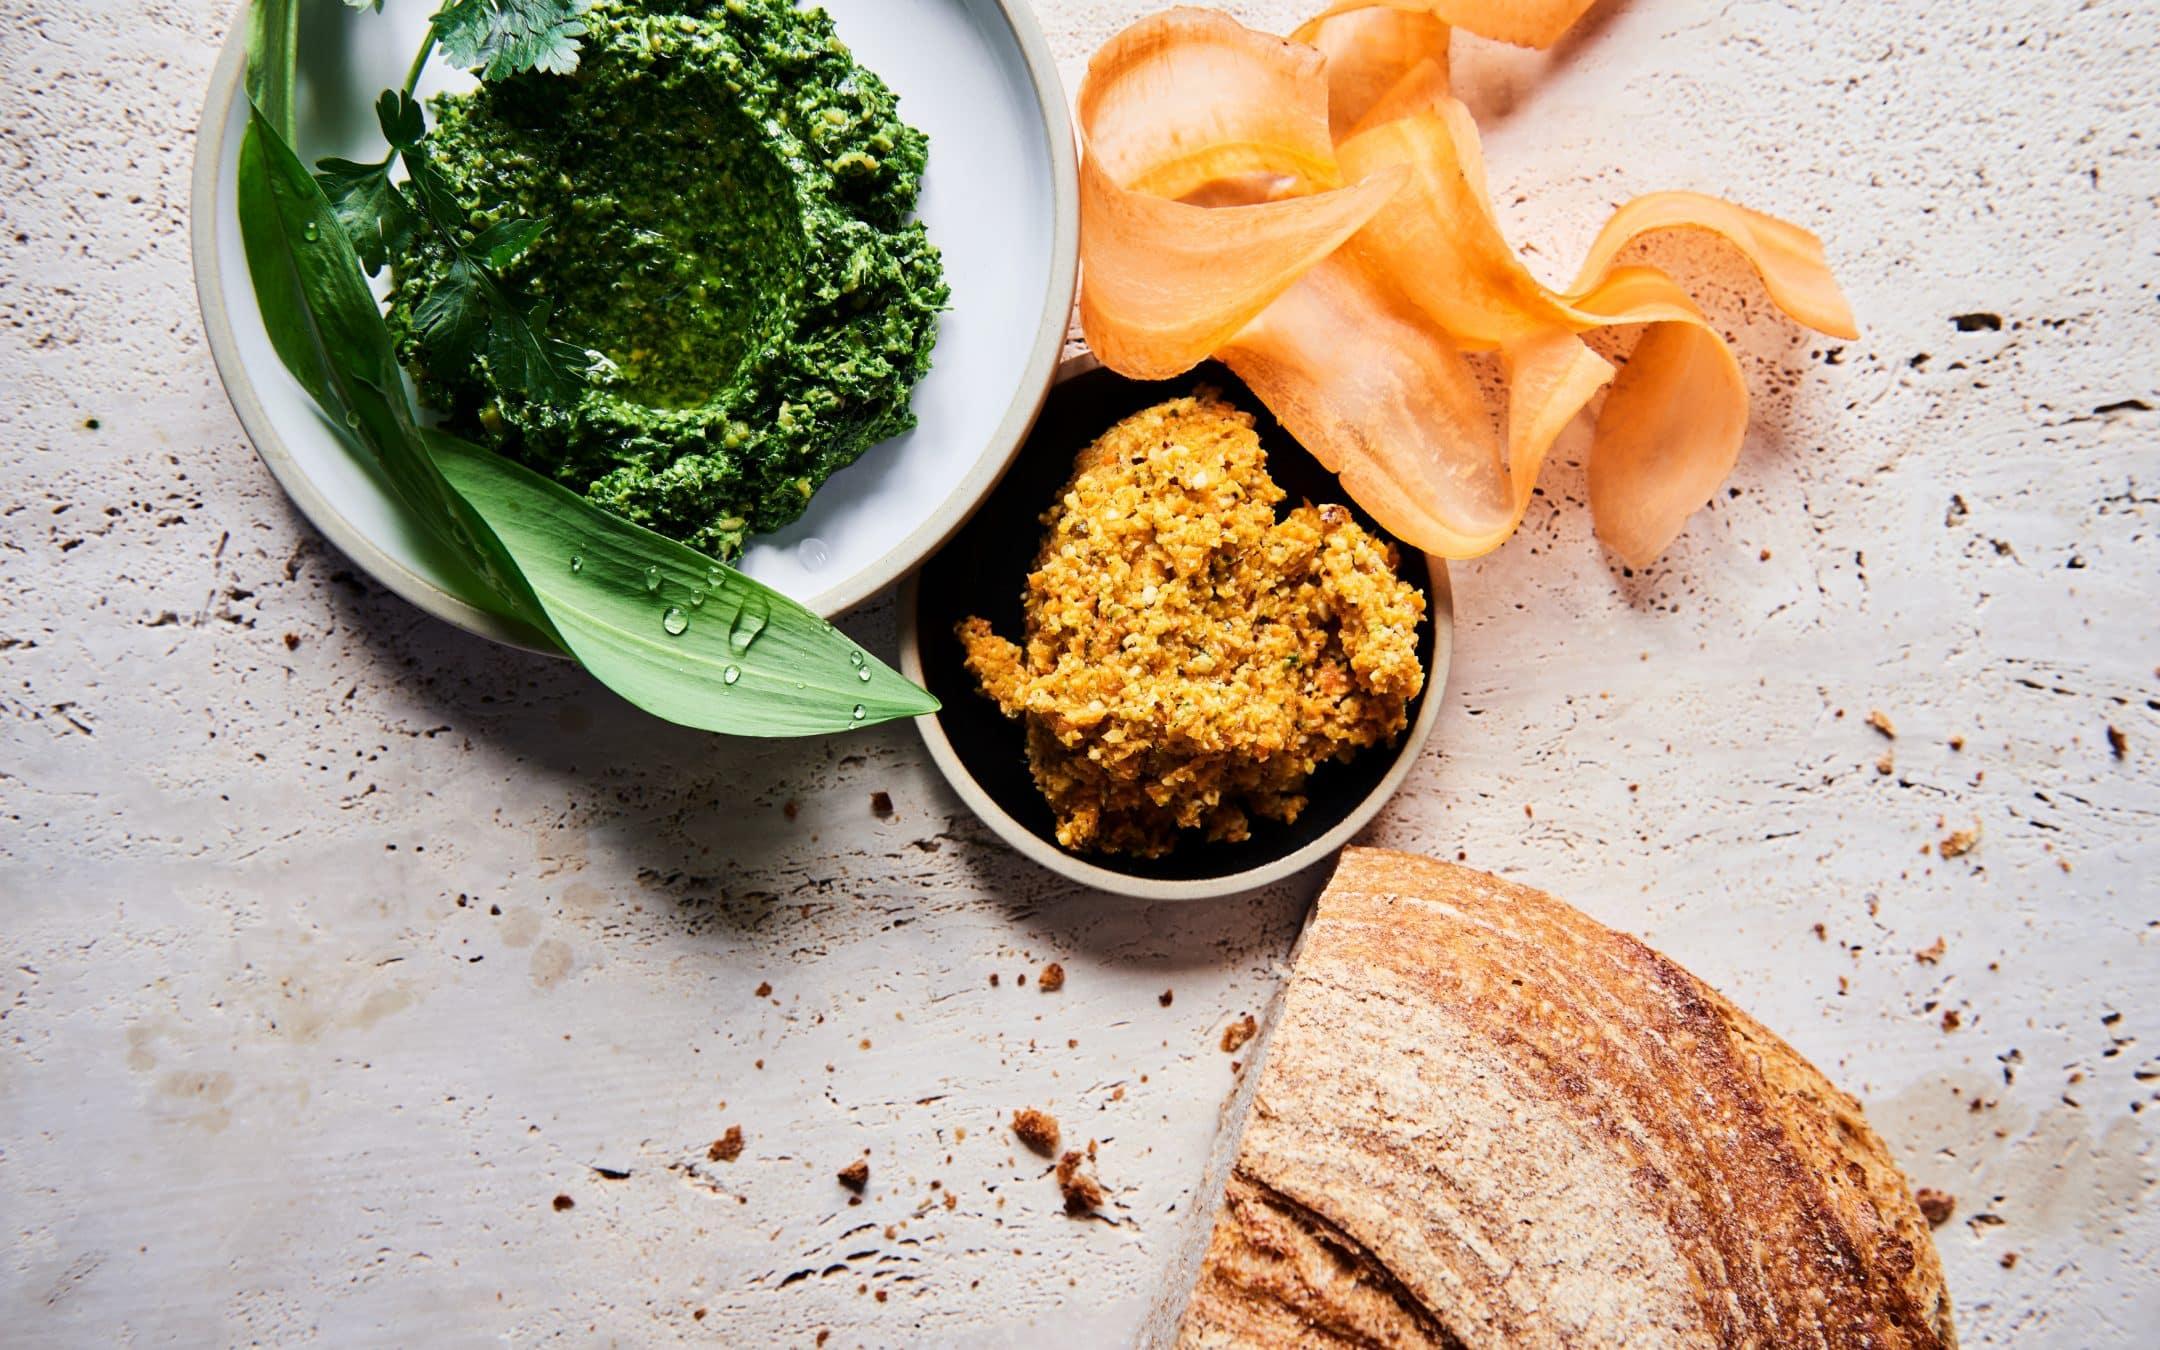 Gulerodspesto med fast modnet ost og persillepesto med blåskimmelost